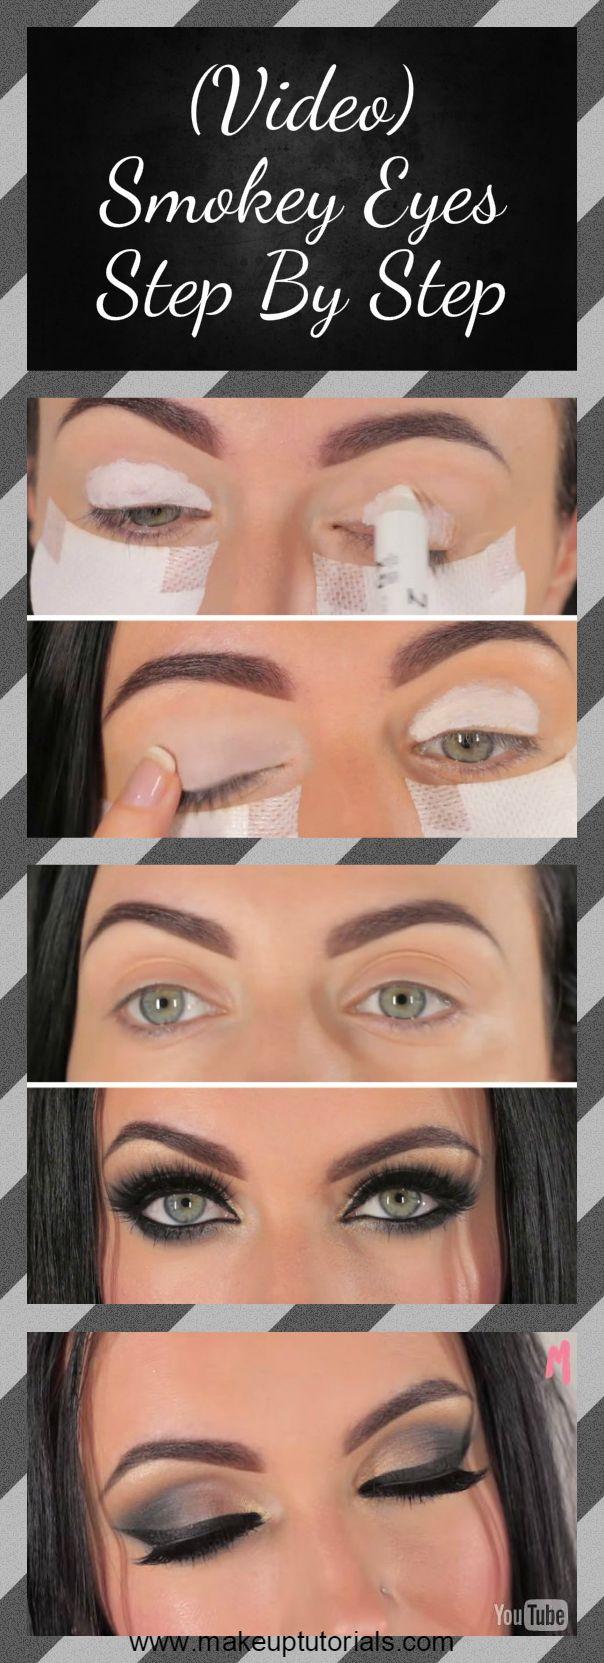 How To Create A Dramatic Smokey Eye   Step by Step Video Tutorials at http://makeuptutorials.com/smokey-eyes-step-by-step/